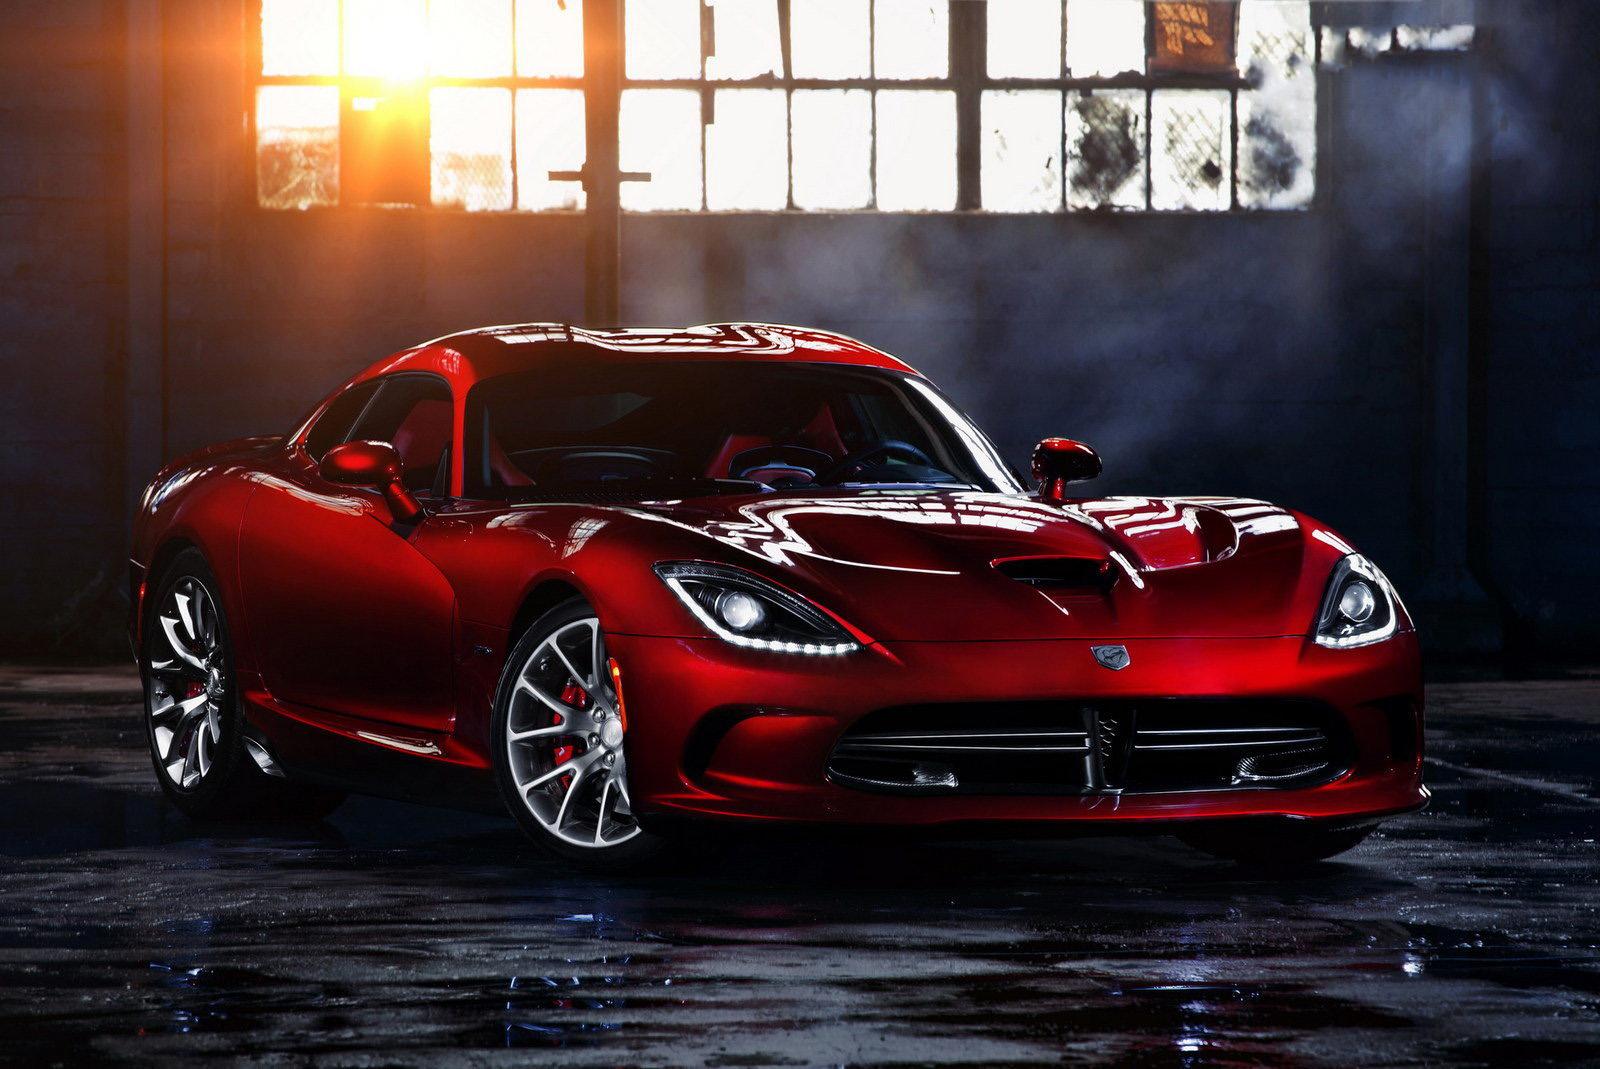 auto 2013 SRT Viper GTS submetido a testes Extremos